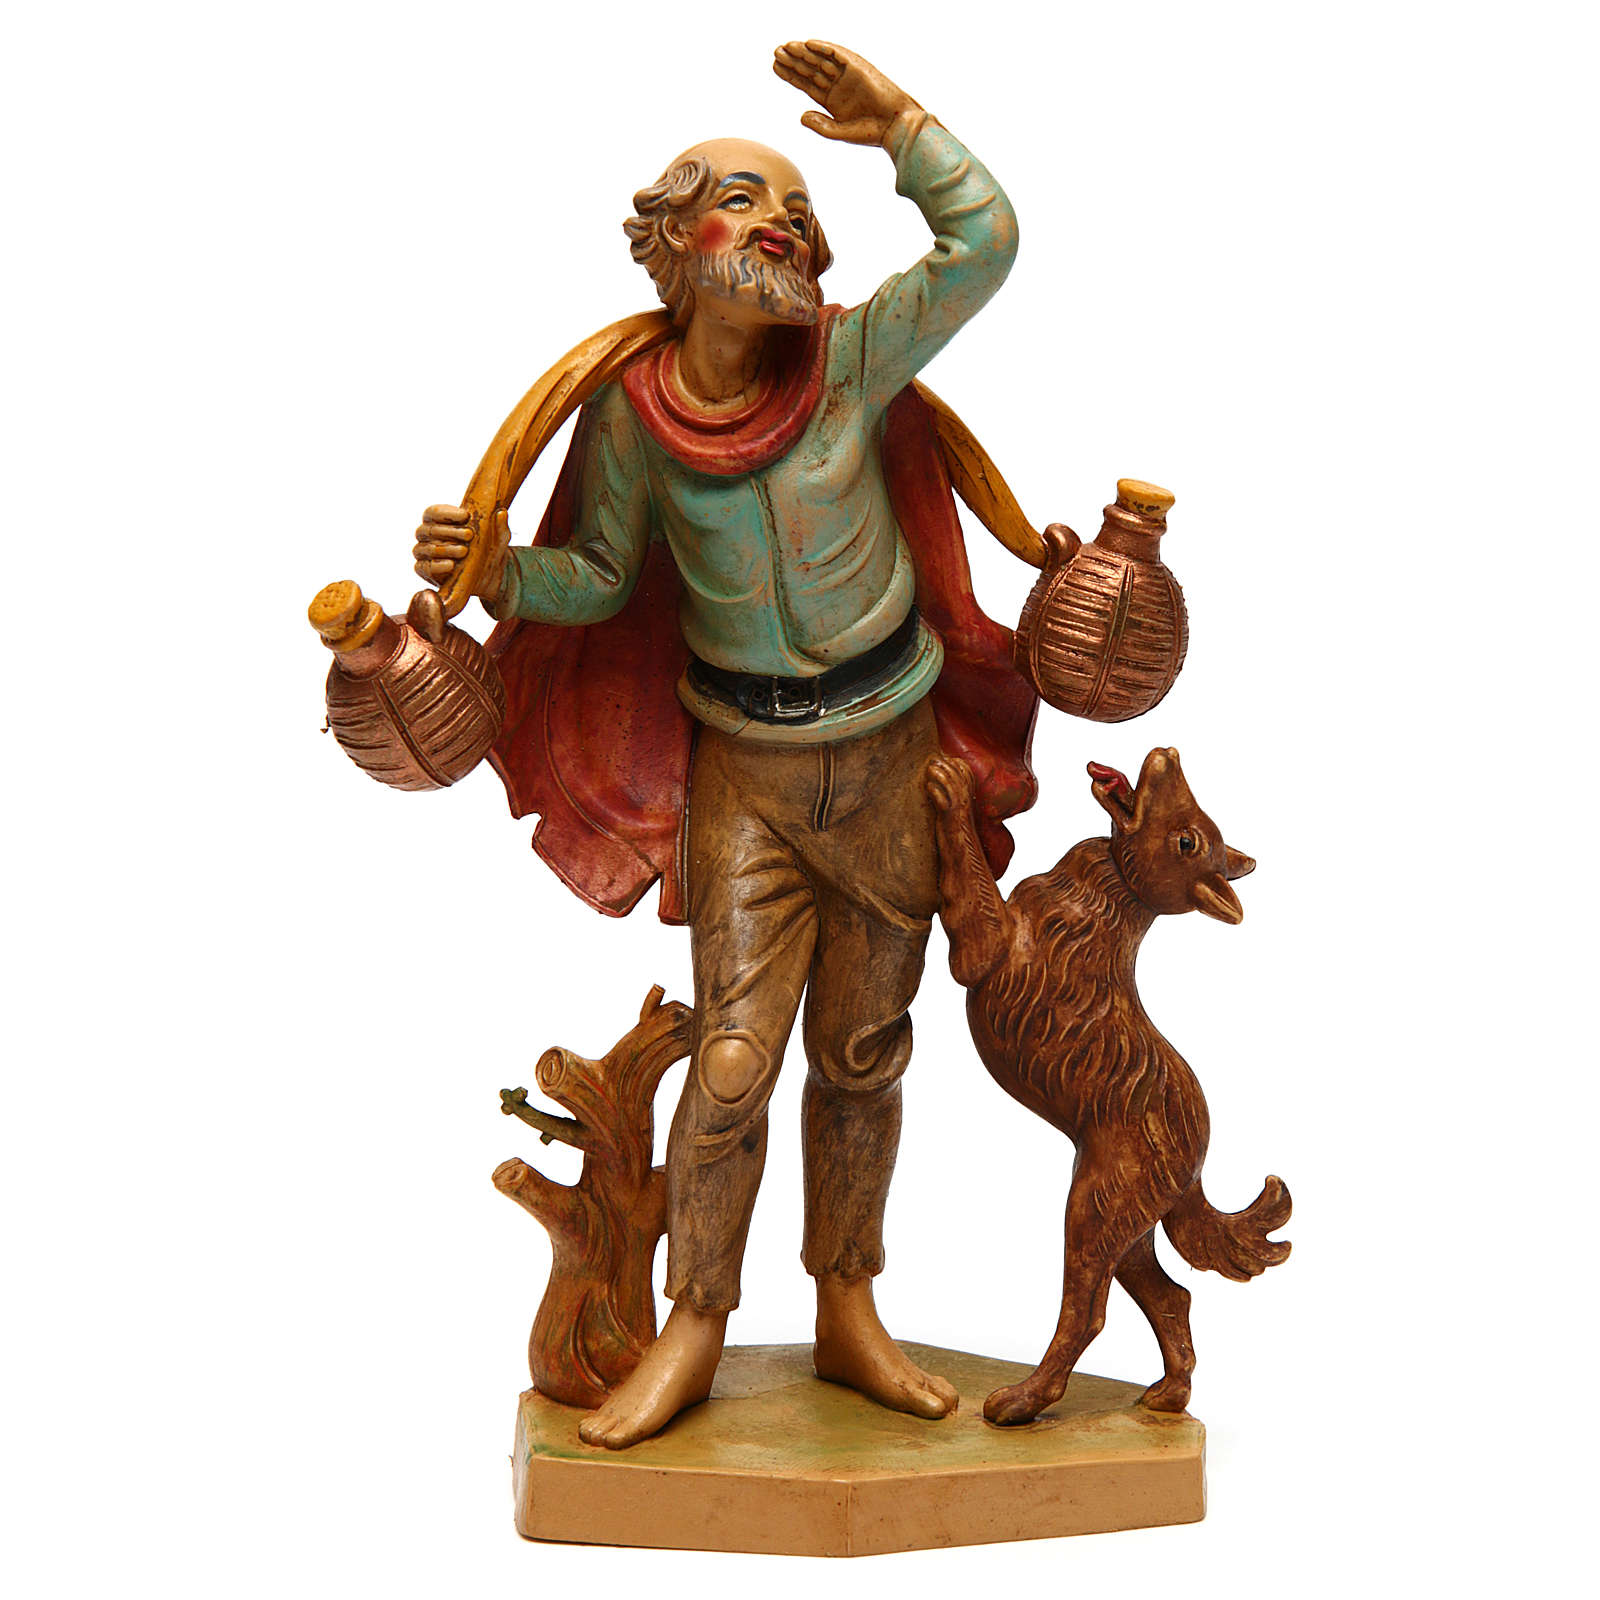 Uomo con cane 16 cm presepe 3